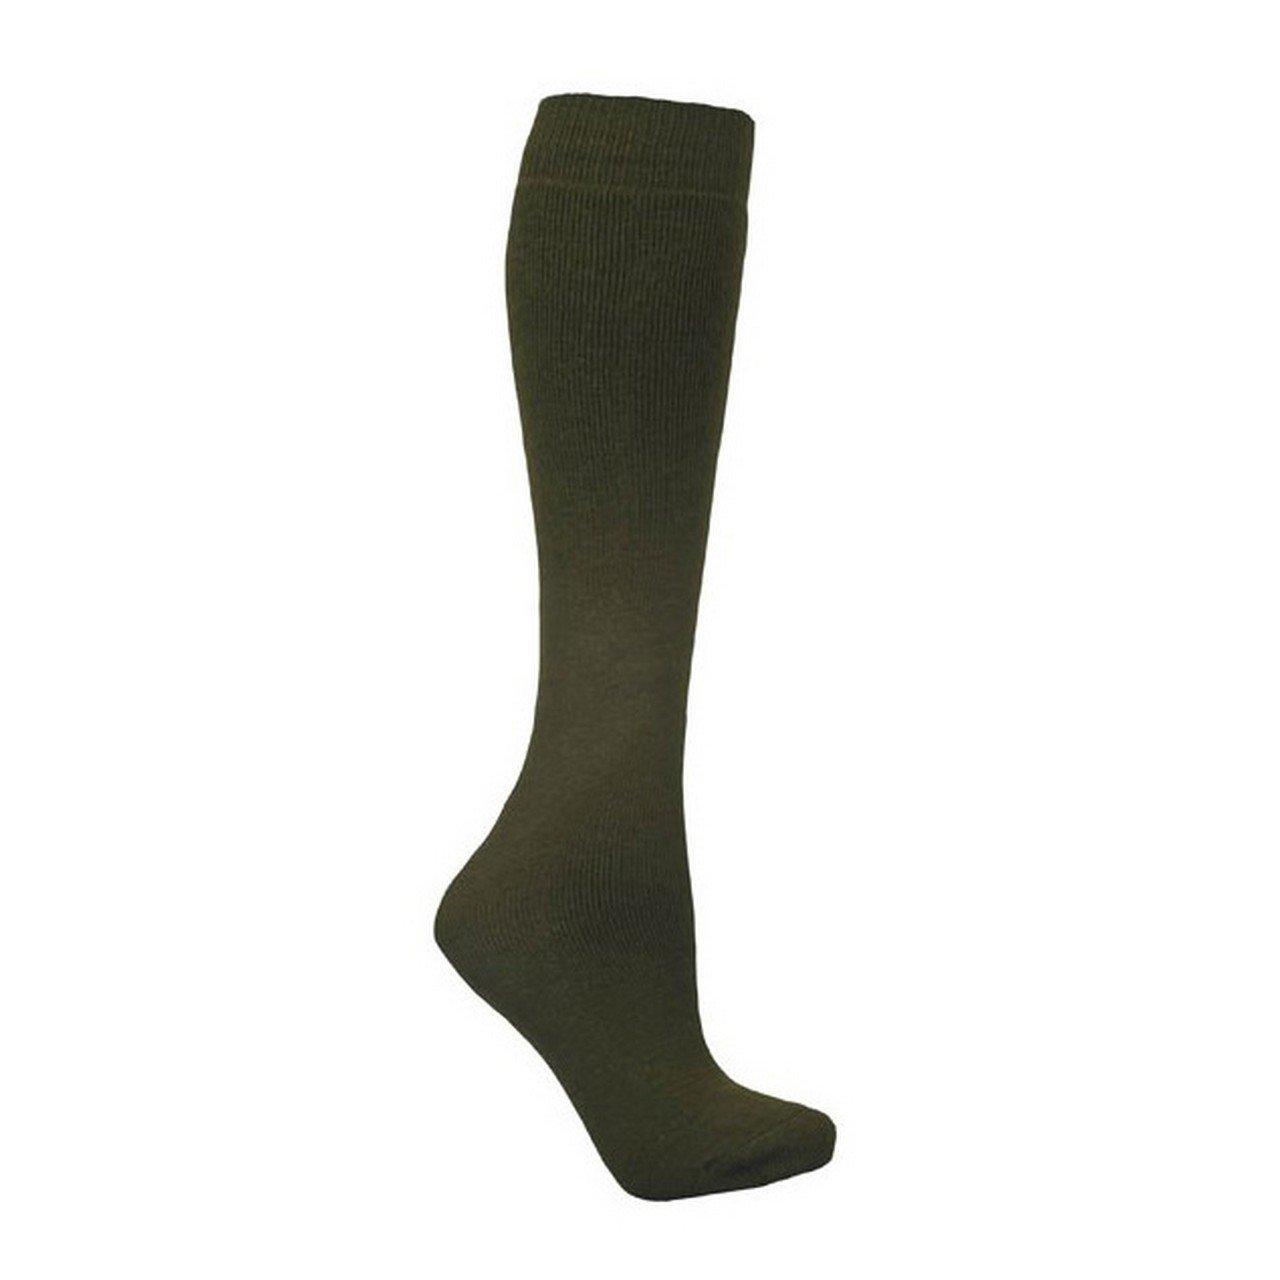 Trespass Adults Unisex Tubular Luxury Wool Blend Ski Tube Socks (5-12 US) (Charcoal) UTTP968_2